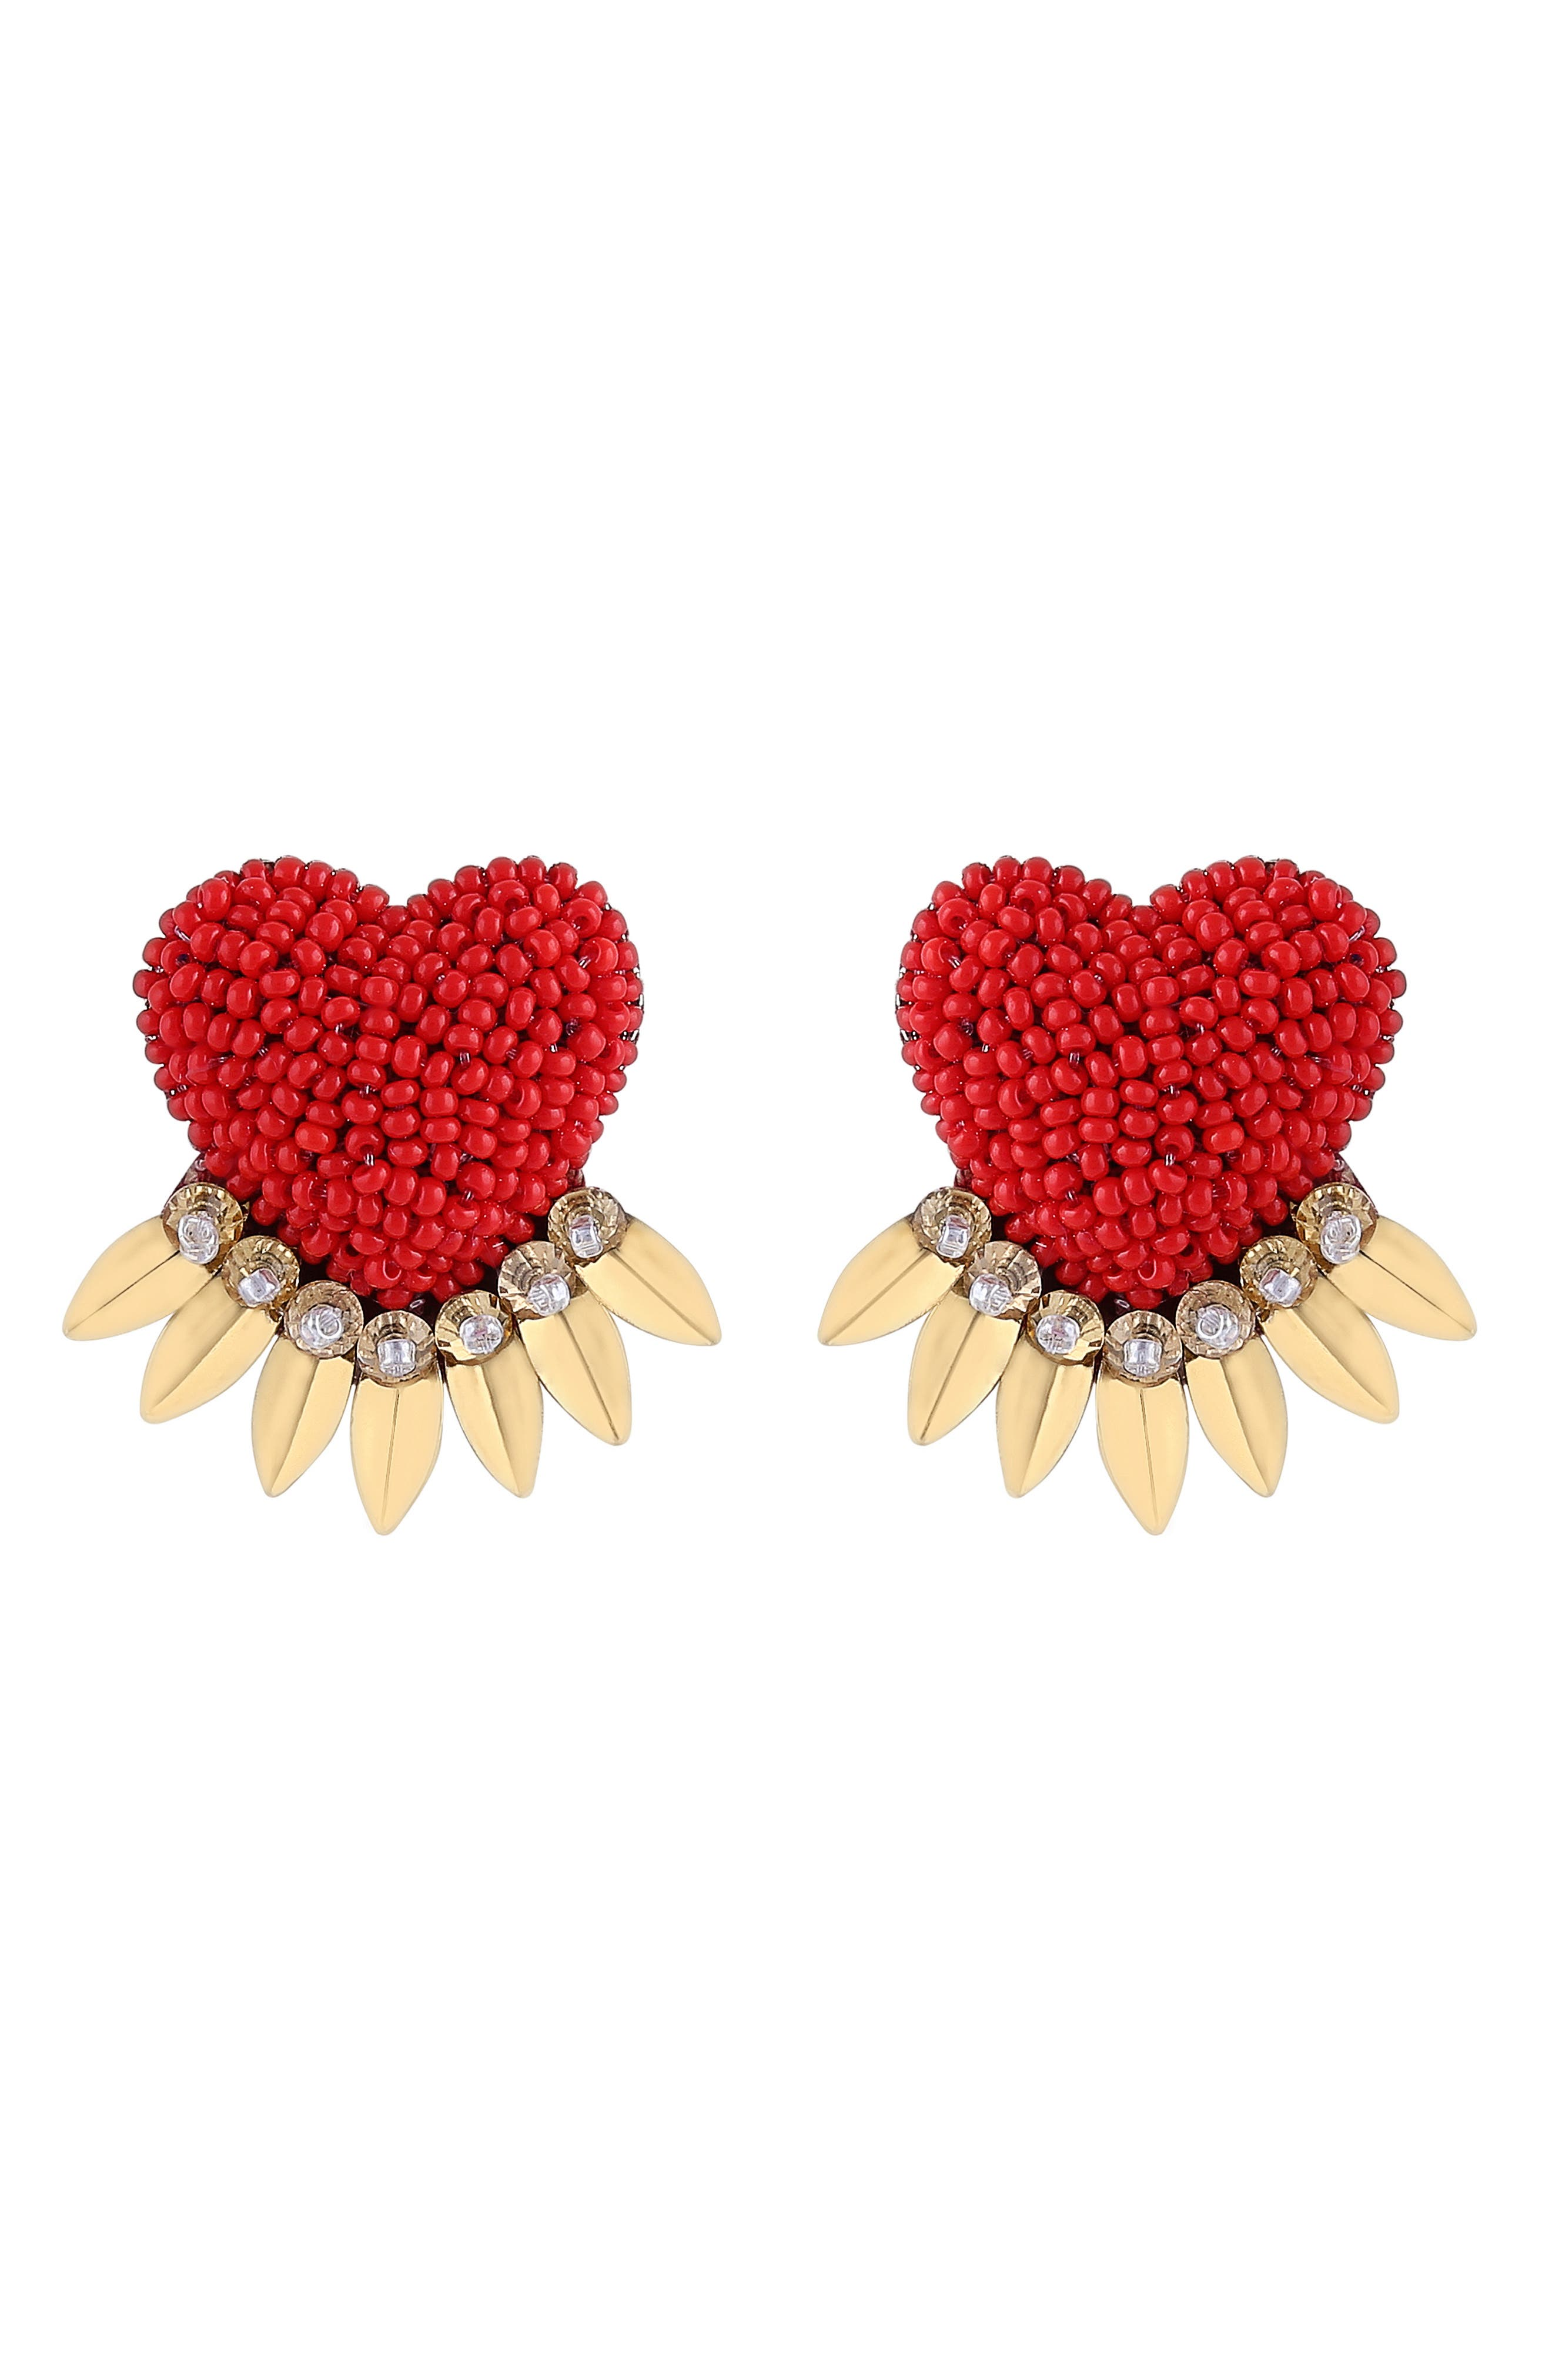 Danika Beaded Fringe Heart Earrings